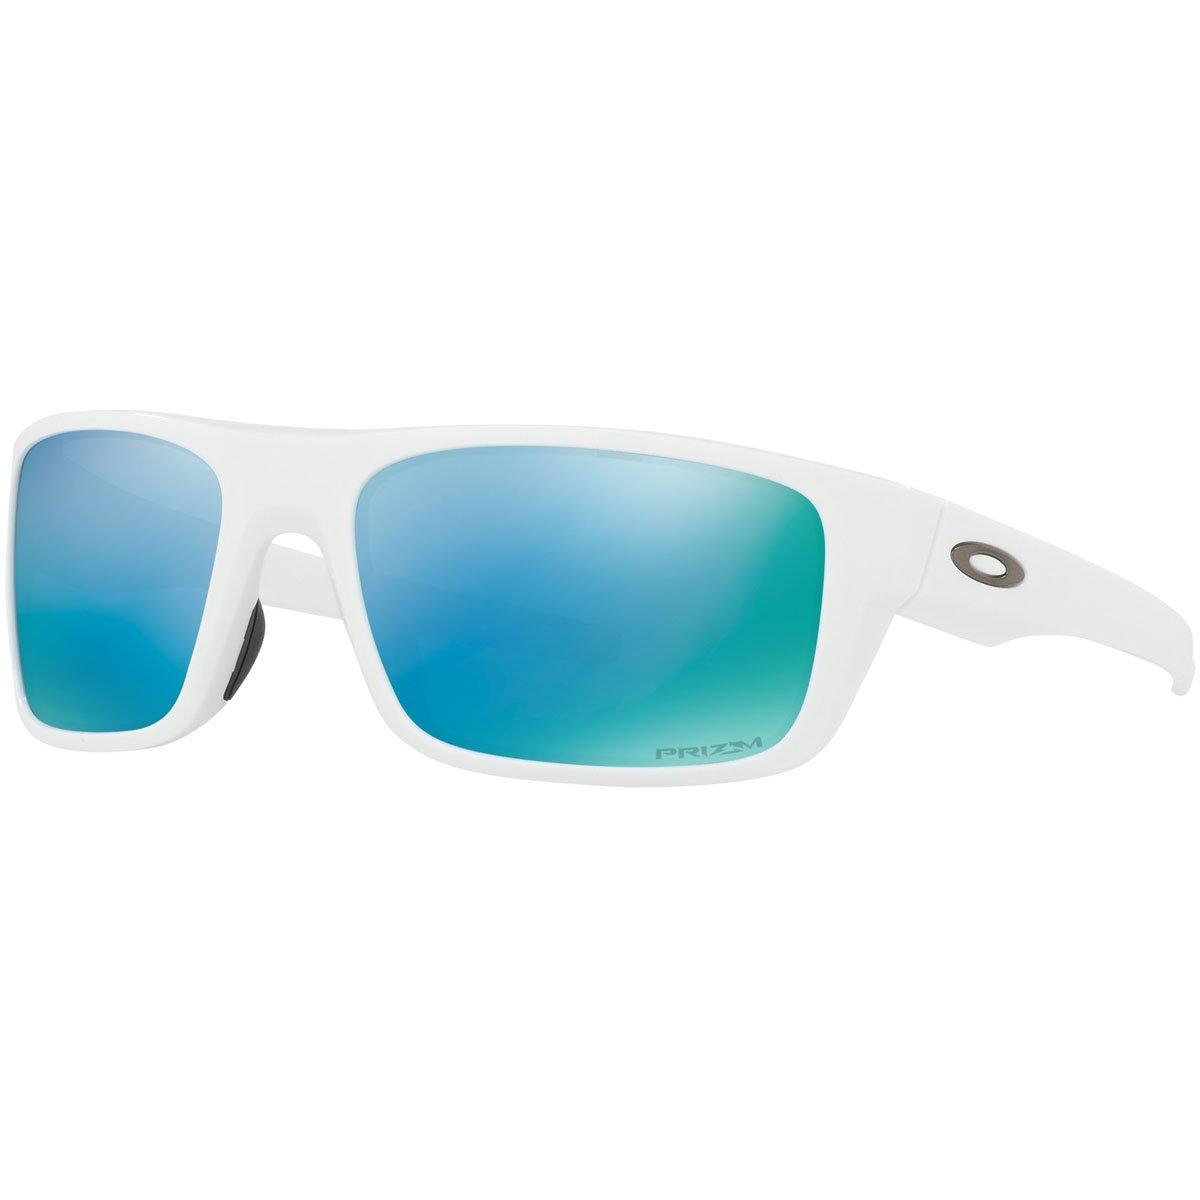 Oakley Men's Drop Point Polarized Sunglasses, Pol Wht/Przm Deep WaterPol,OS